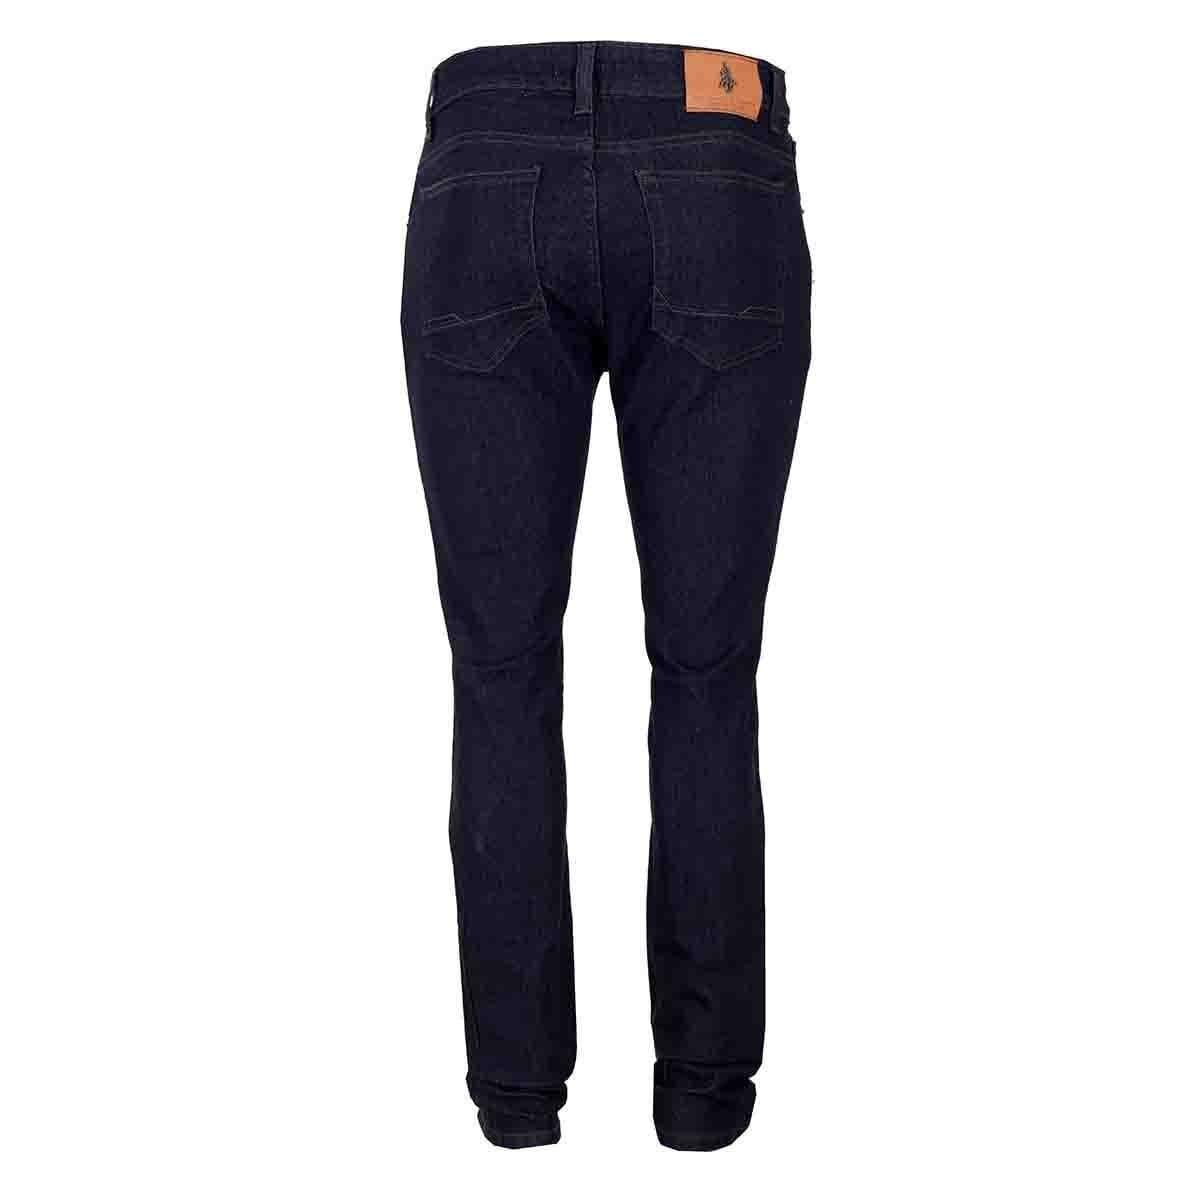 Jeans Color Azul Obscuro Polo Club